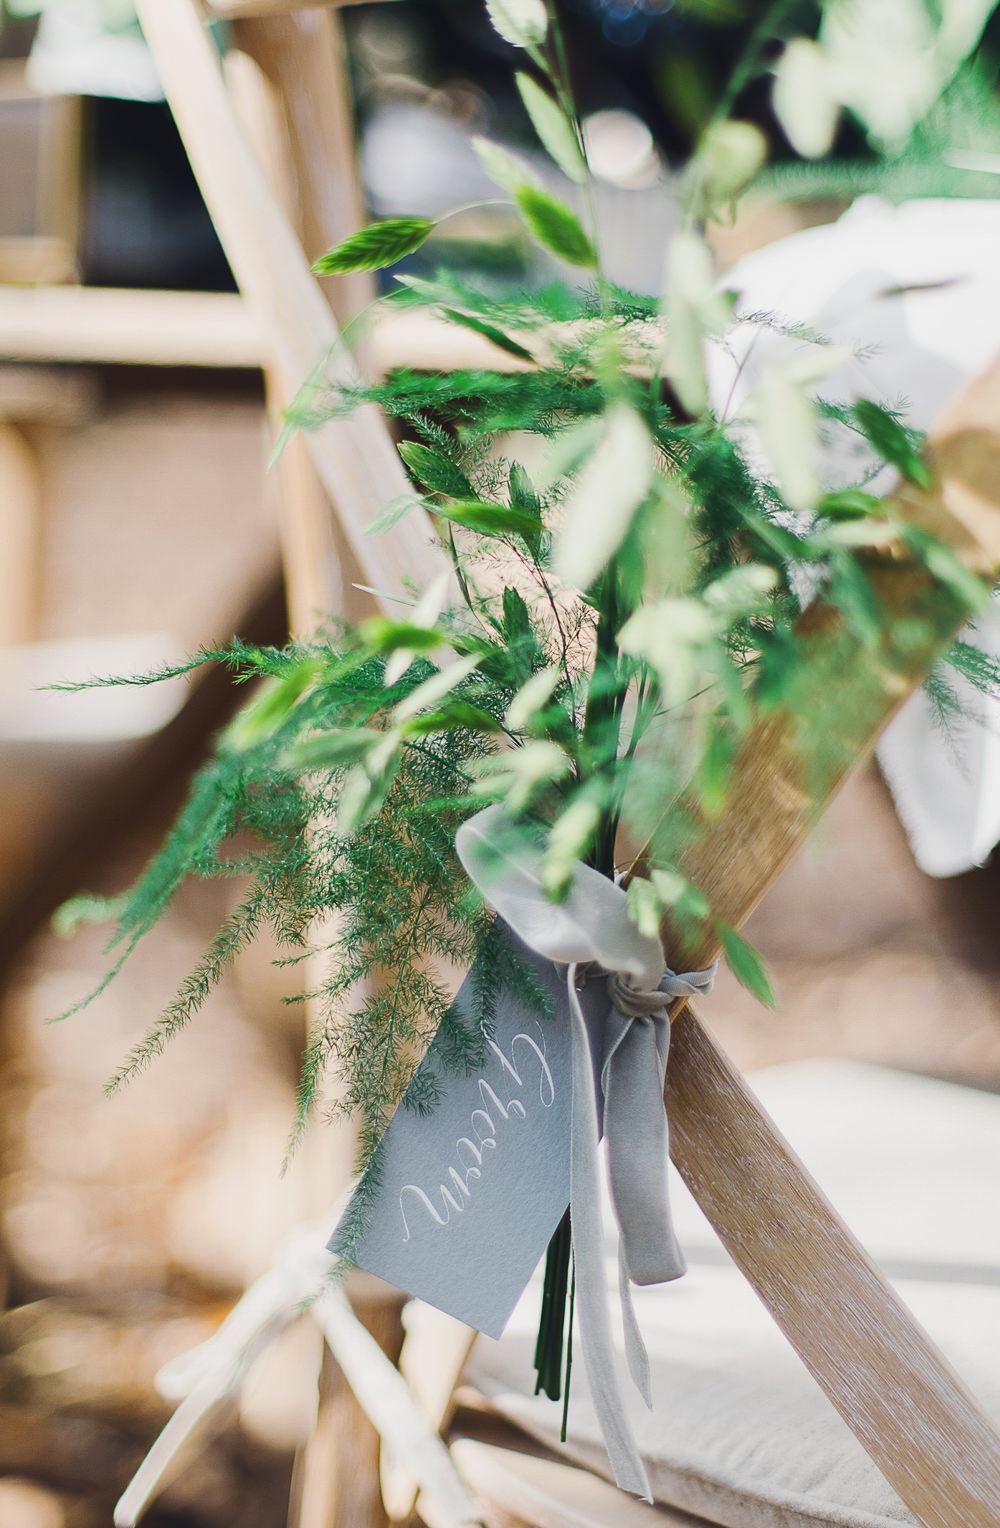 Chair Flowers Greenery Velvet Ribbon Grey Name Tag Nordic Woodland Elopement Wedding Ideas Nina Wernicke Photography